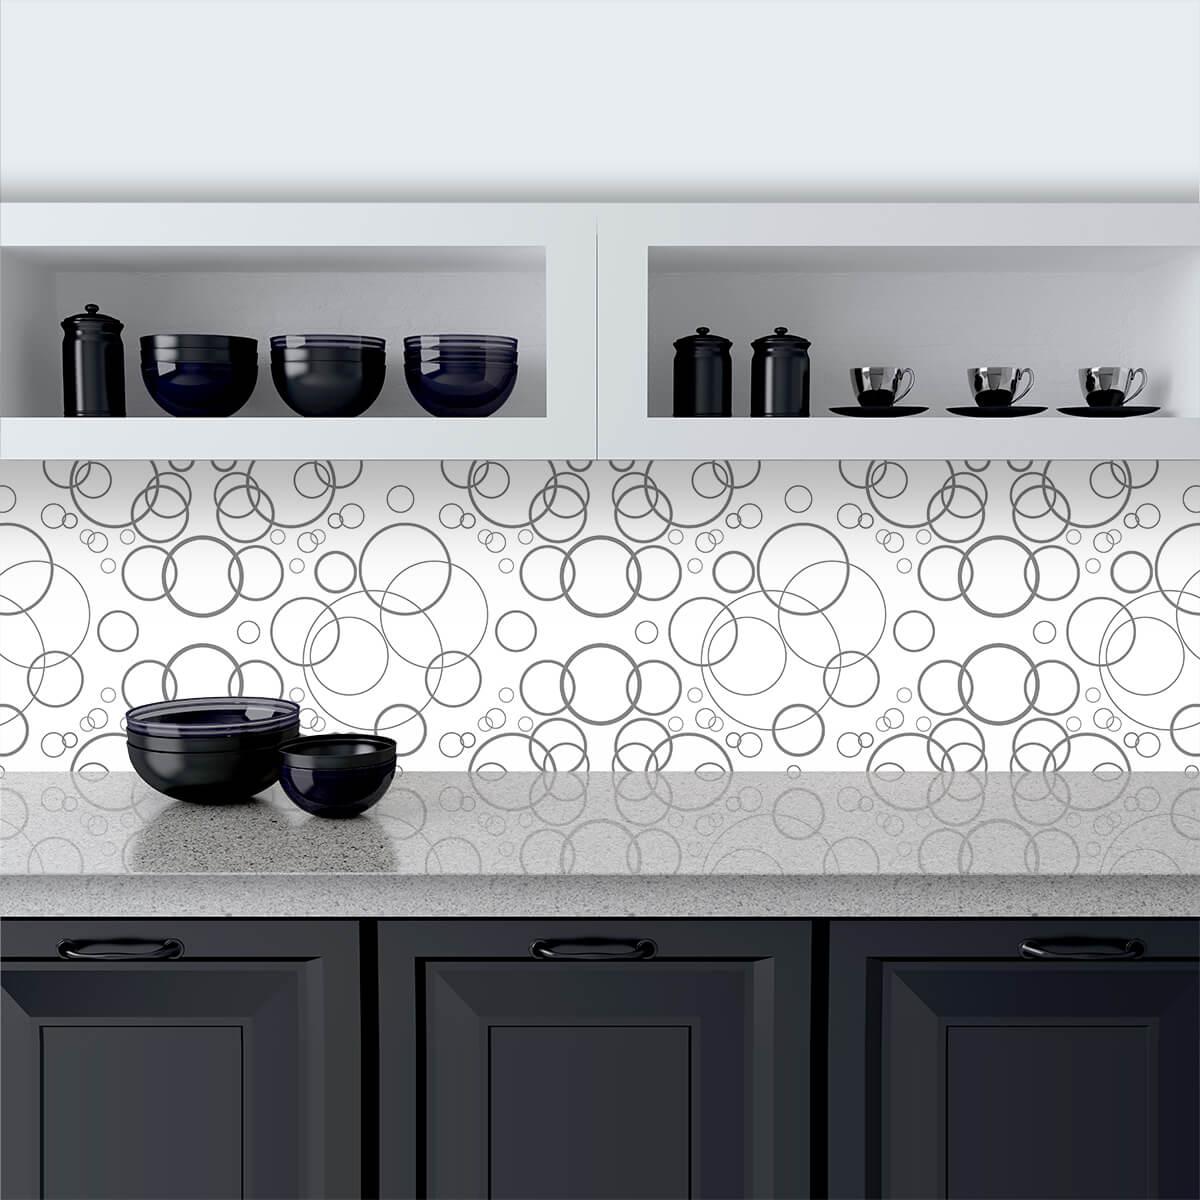 Küchenrückwand aus Glas Bubbles